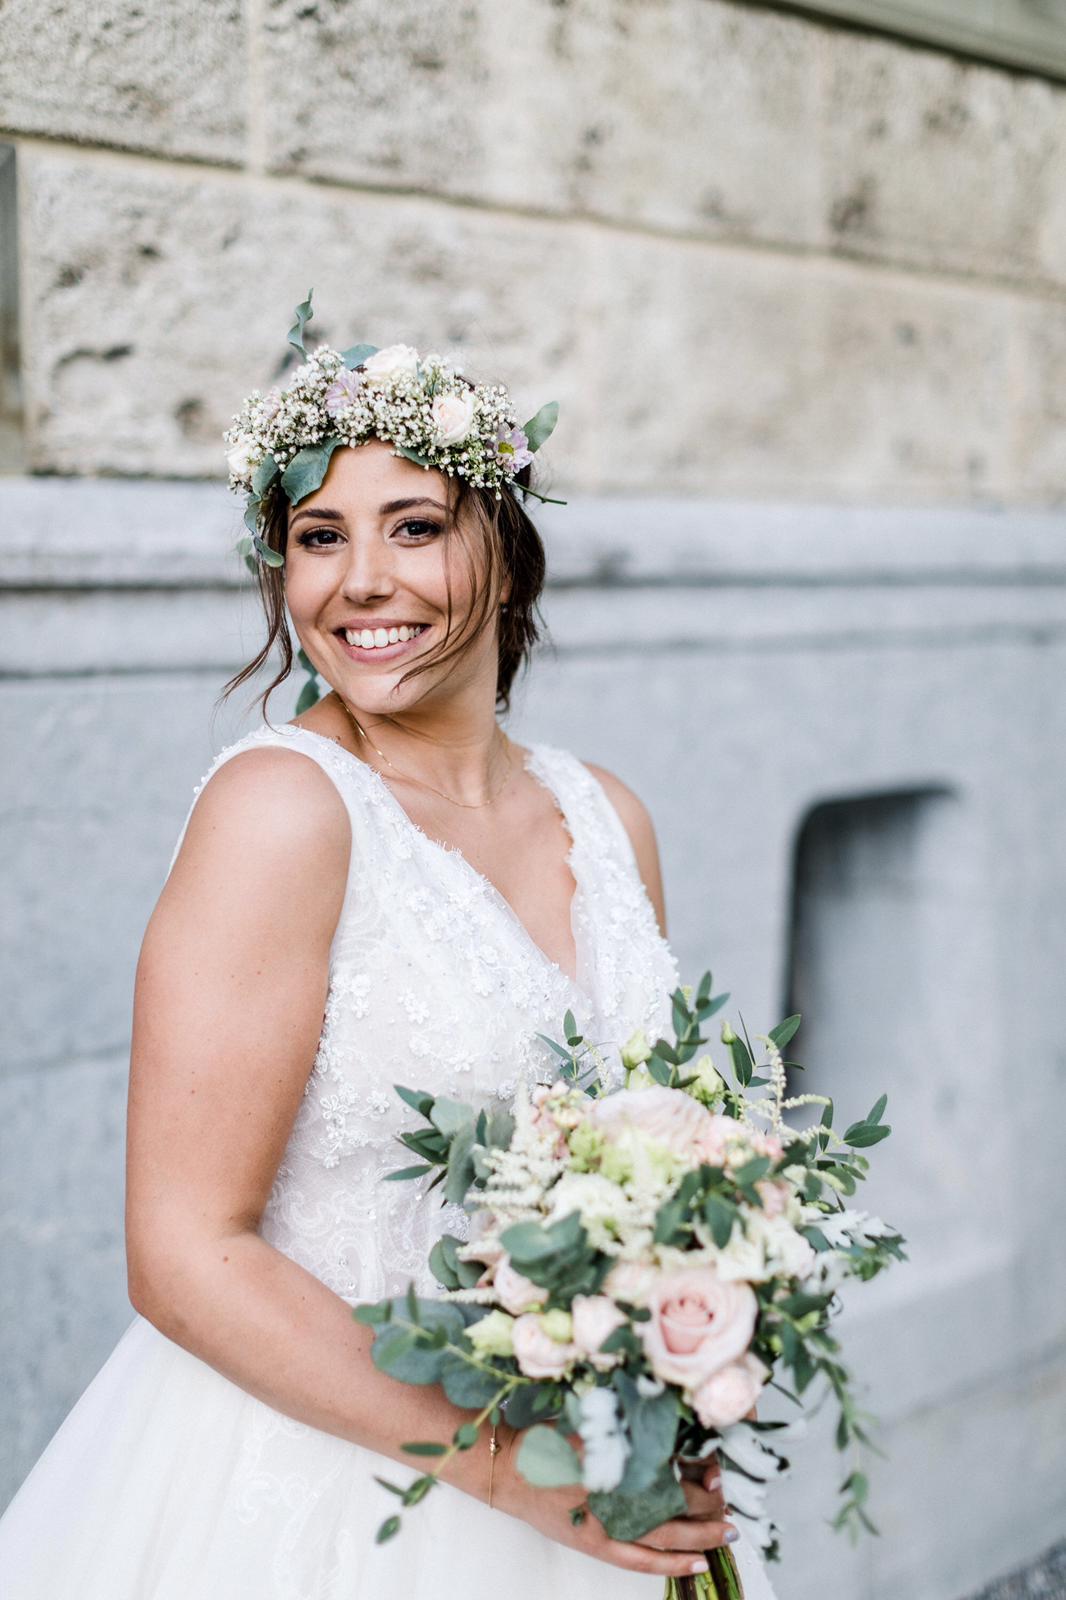 customised+bespoke+v+neck+a+line+wedding+dress+bride+ccm.jpeg